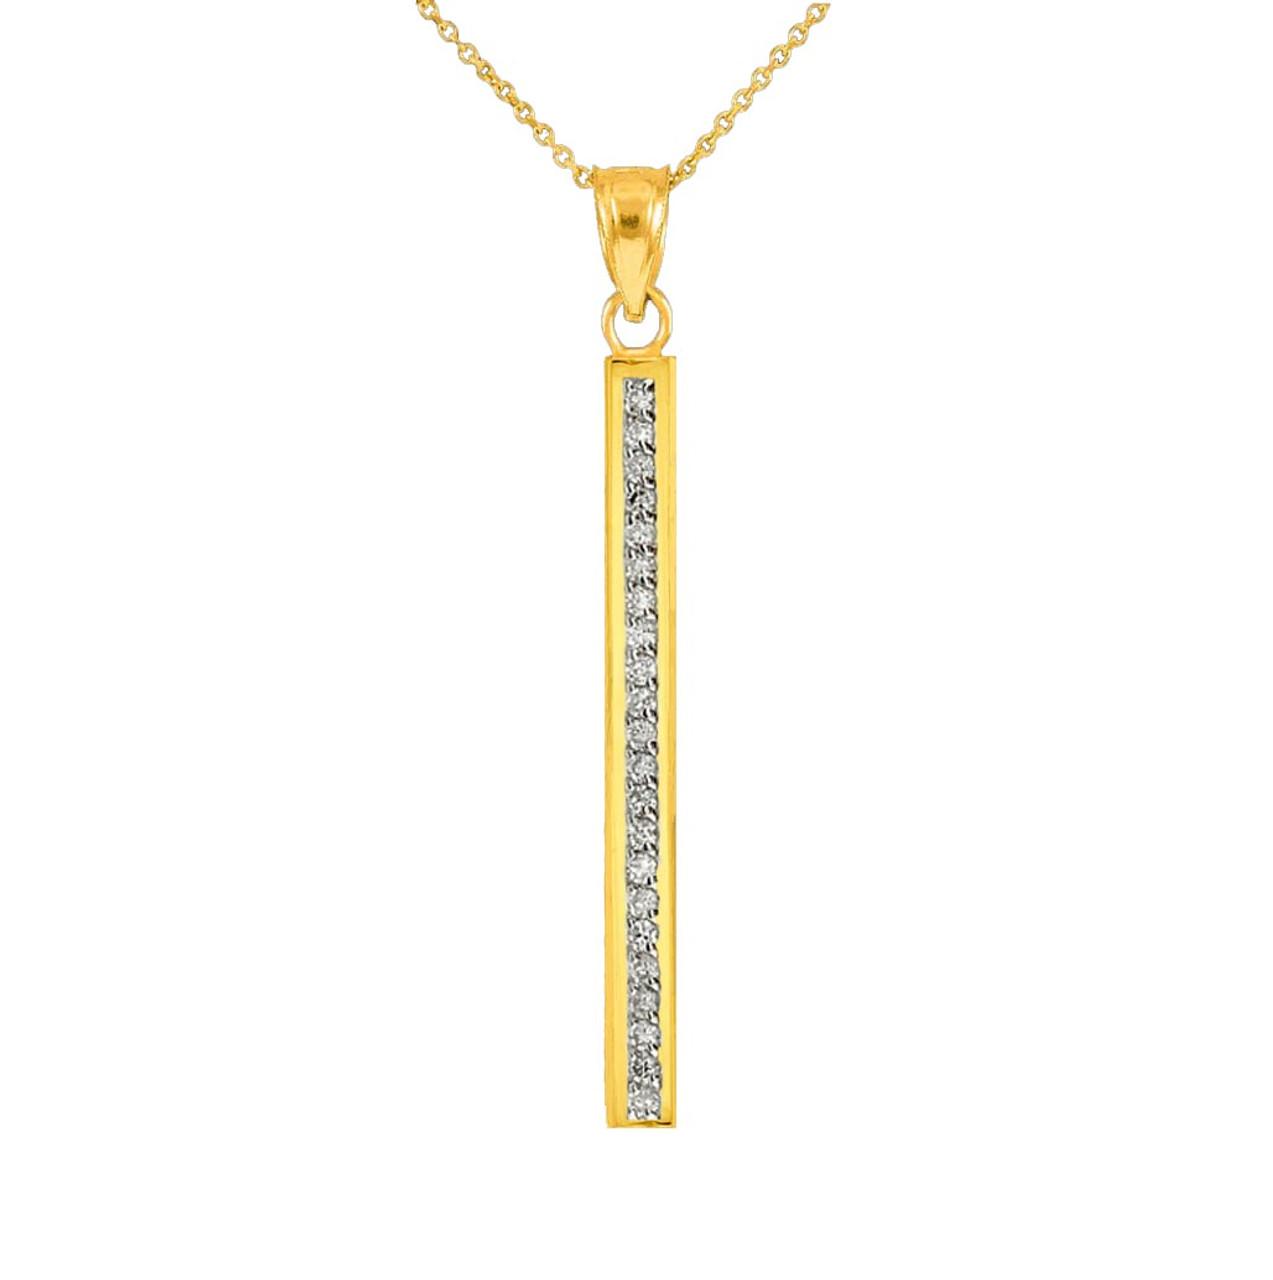 14k gold vertical bar necklace bar